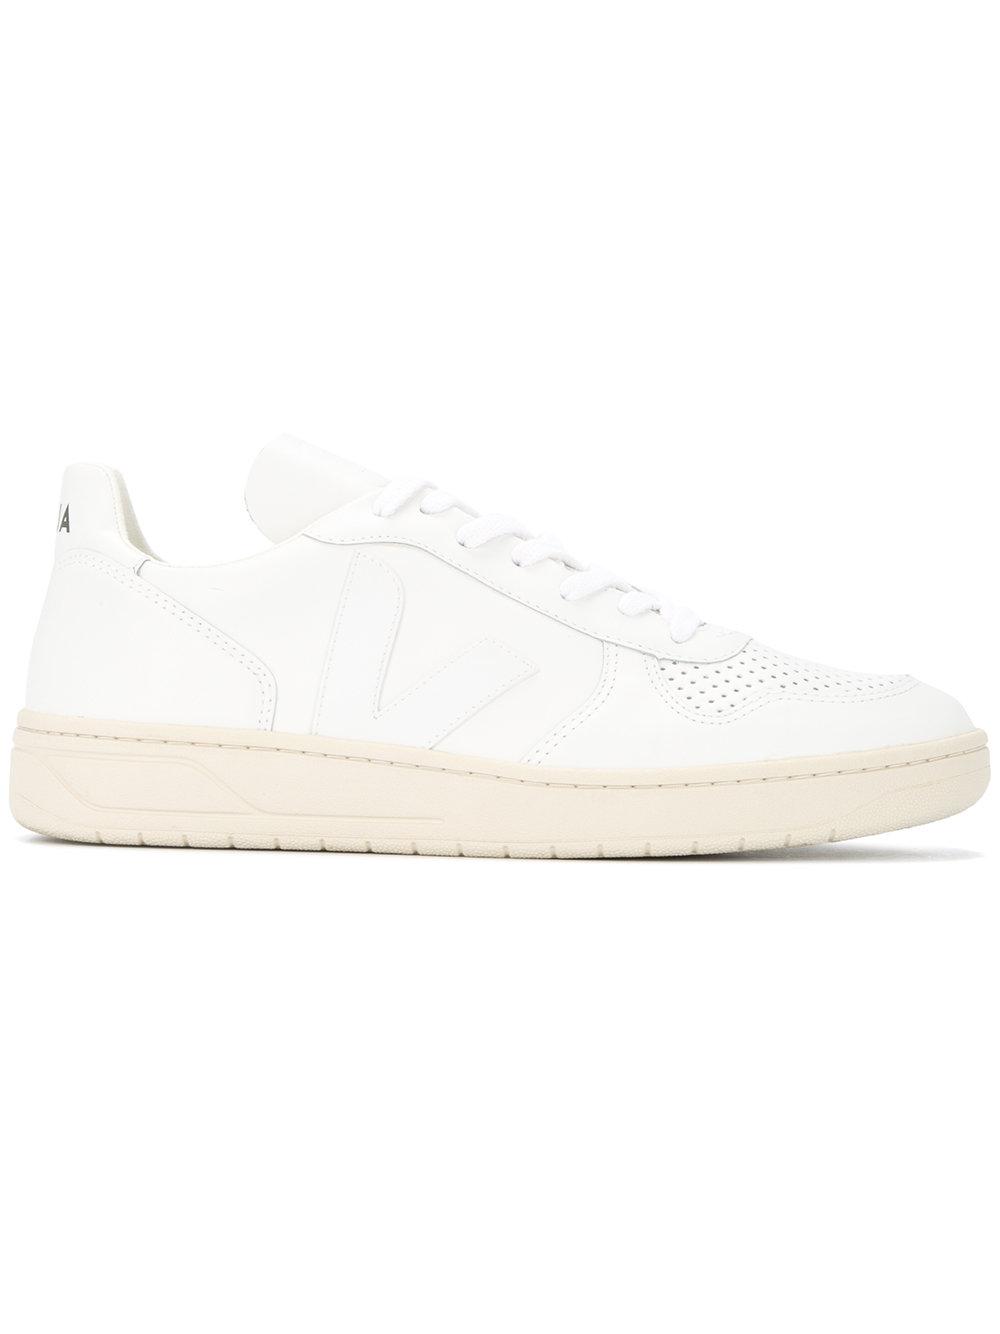 Veja V-10 sneakers - White bbbab82d73